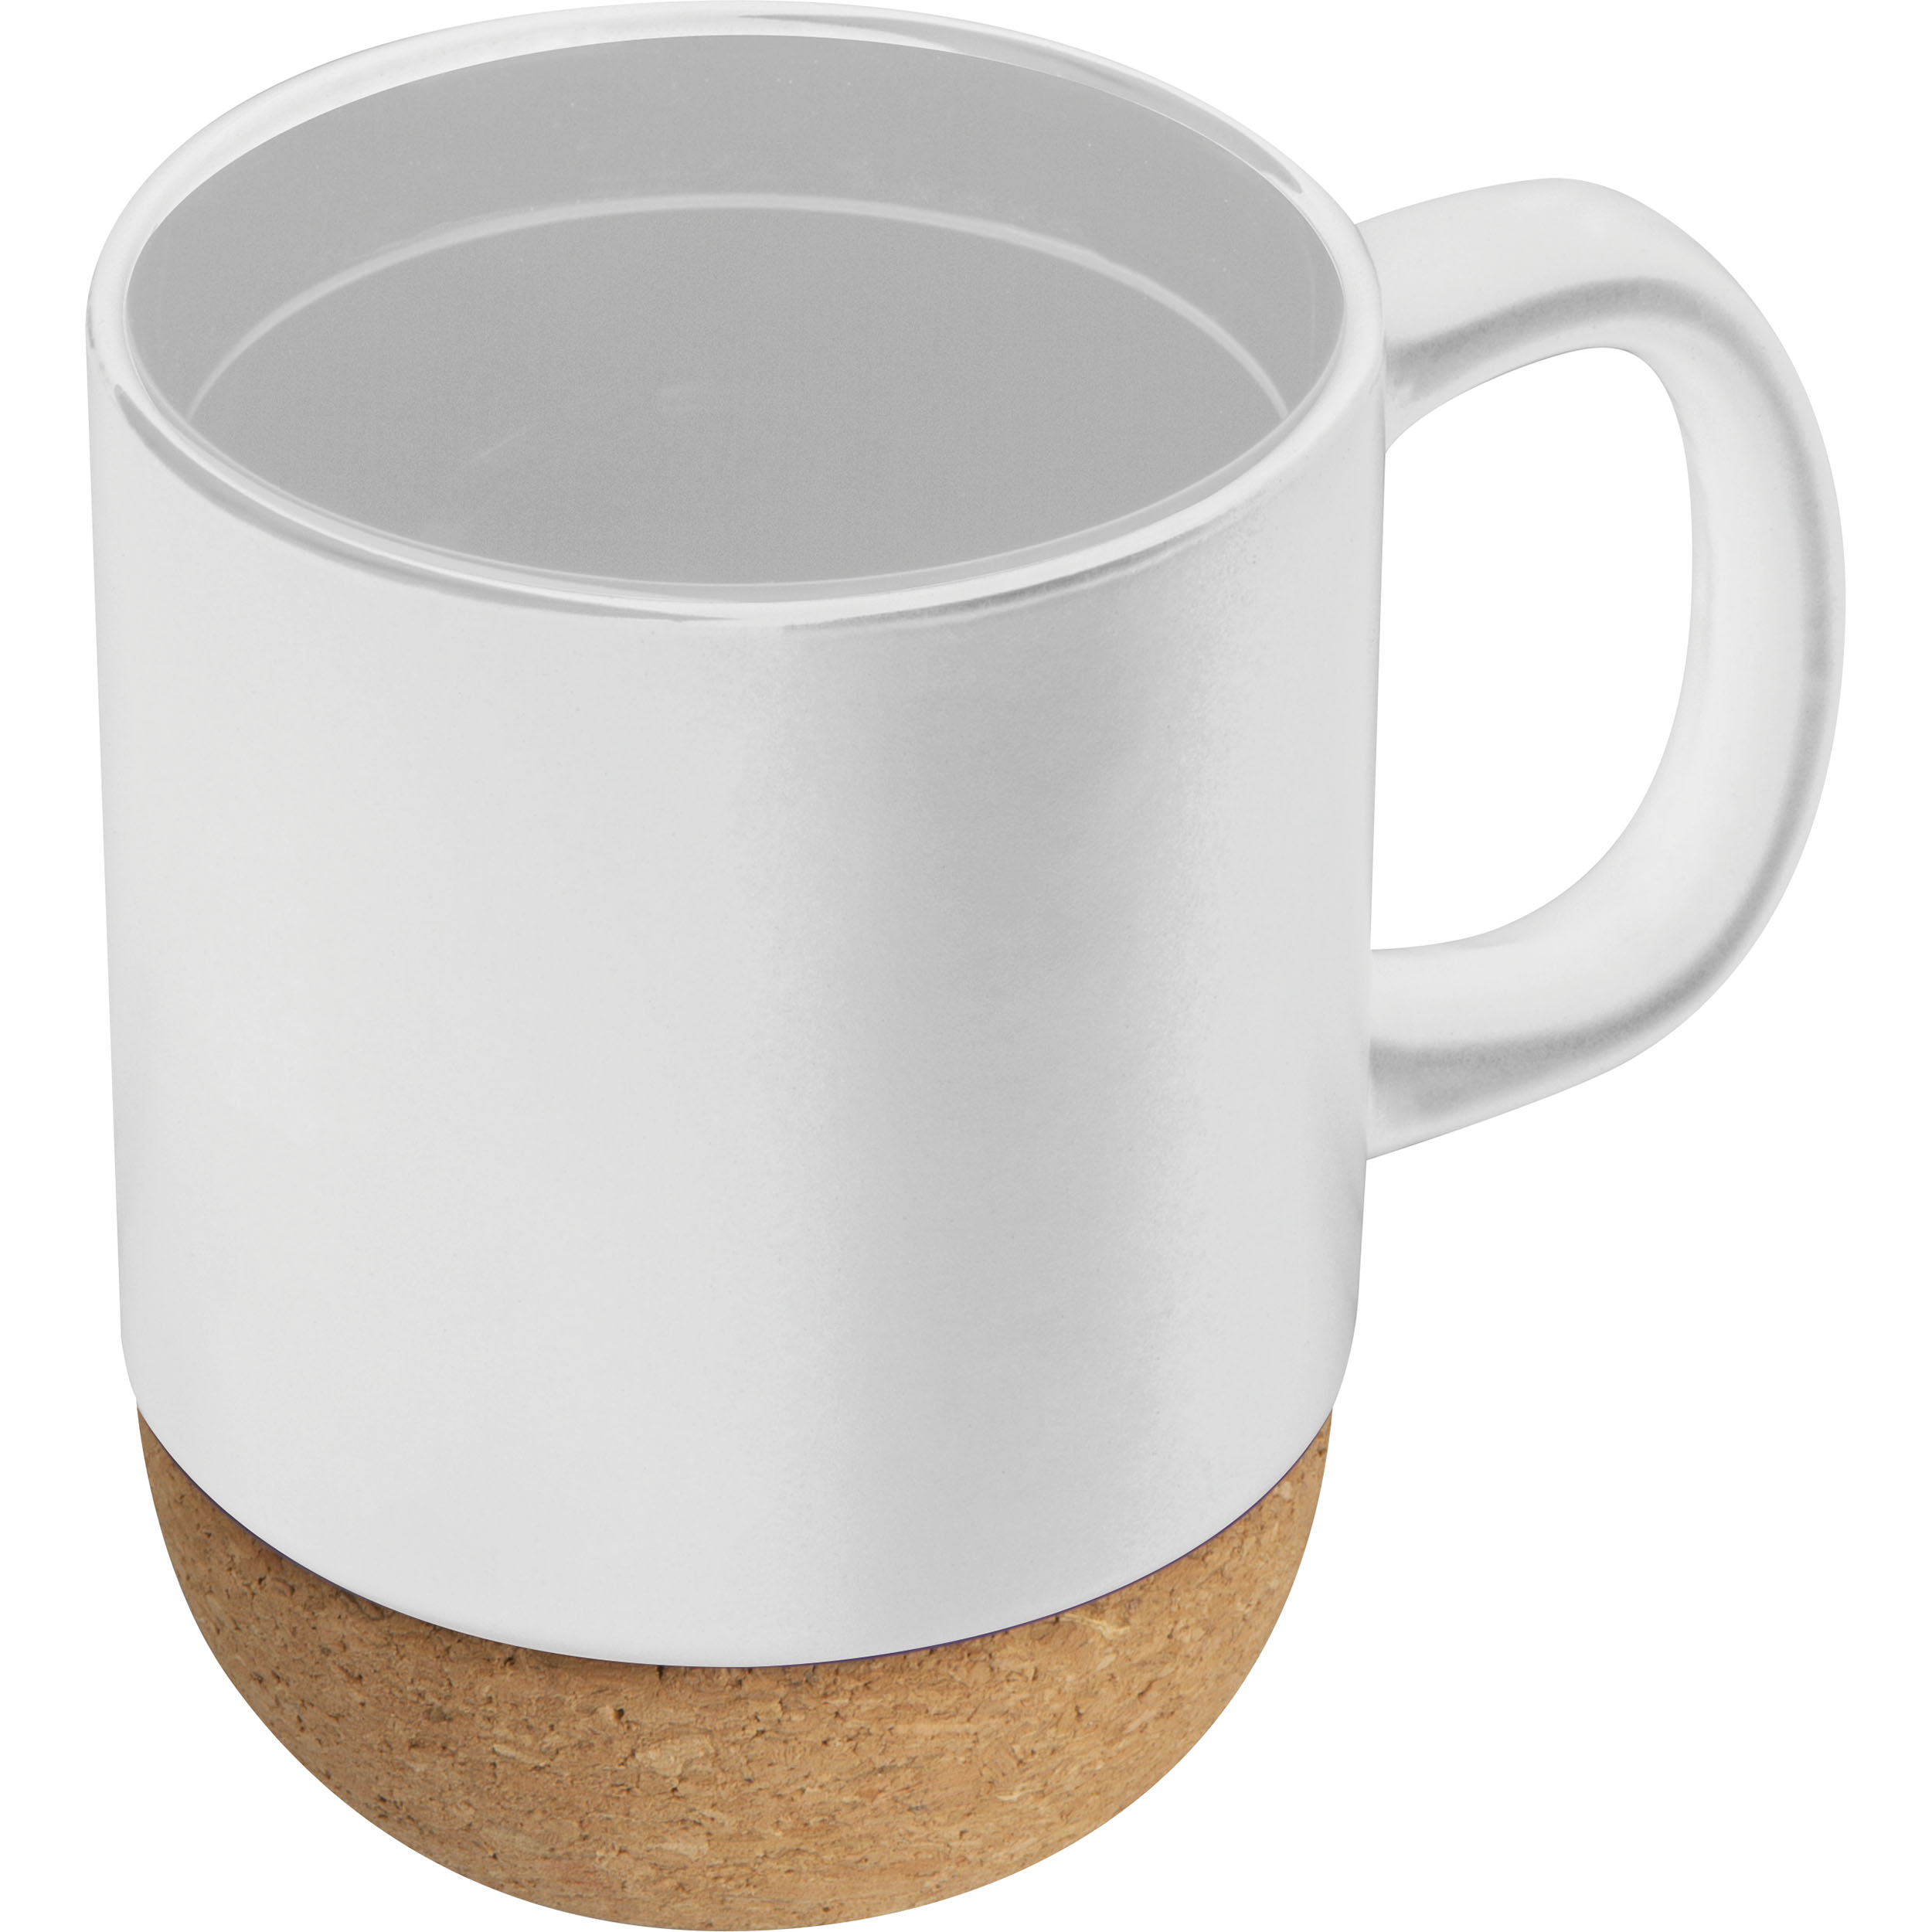 Ceramic Mug with Cork Ground